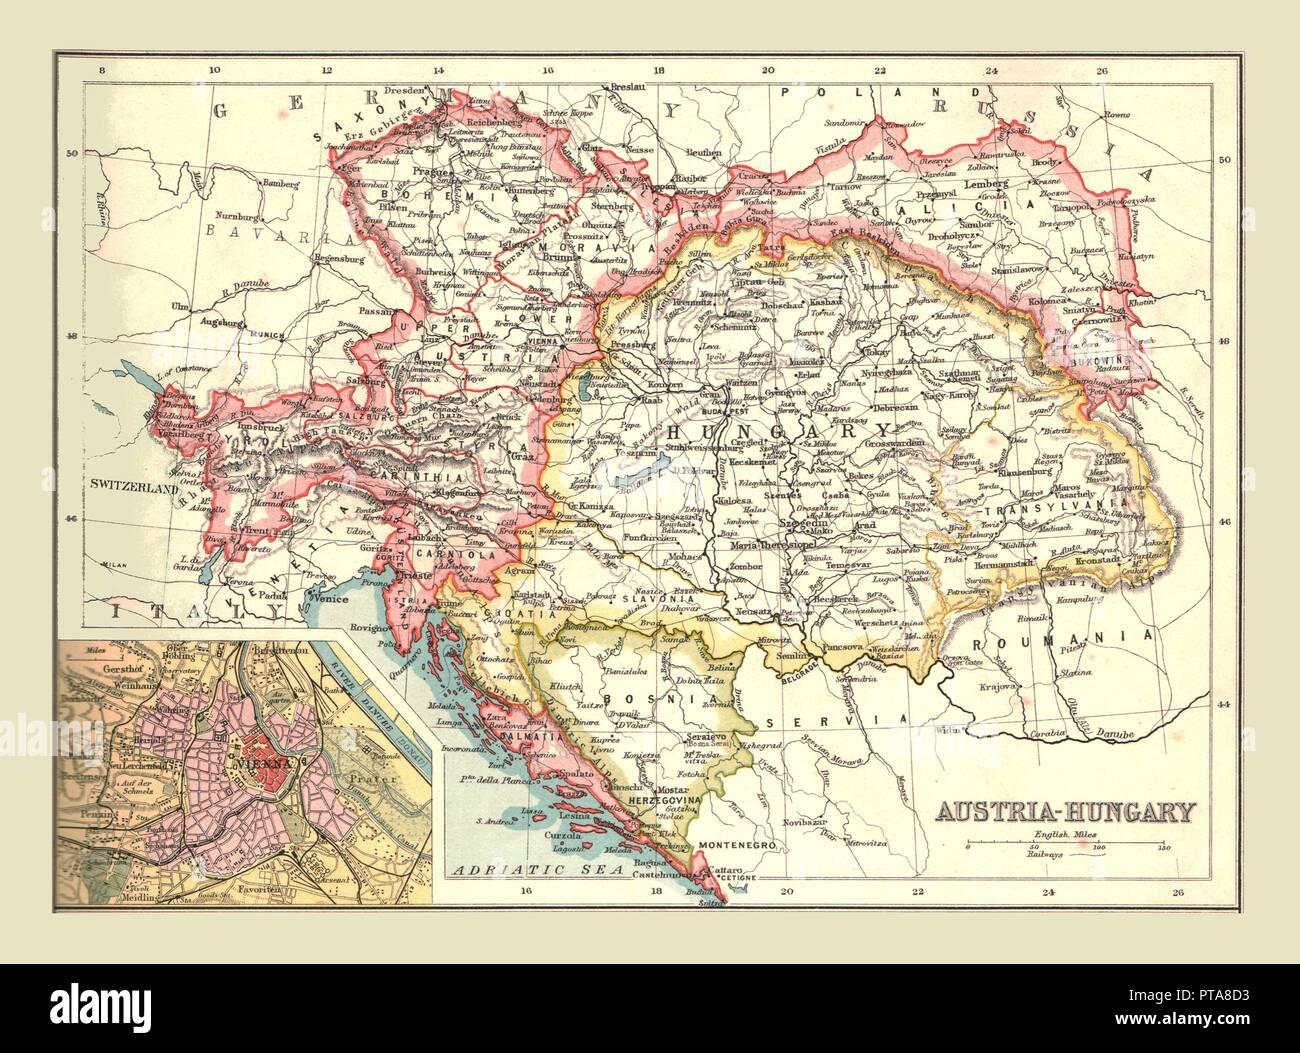 Map of Austria-Hungary, 1902. The Austro-Hungarian Empire including Bosnia, Transylvania, Bohemia, Dalmatia, Silesia, with inset of Vienna. From The Century Atlas of the World. [John Walker & Co, Ltd., London, 1902] - Stock Image